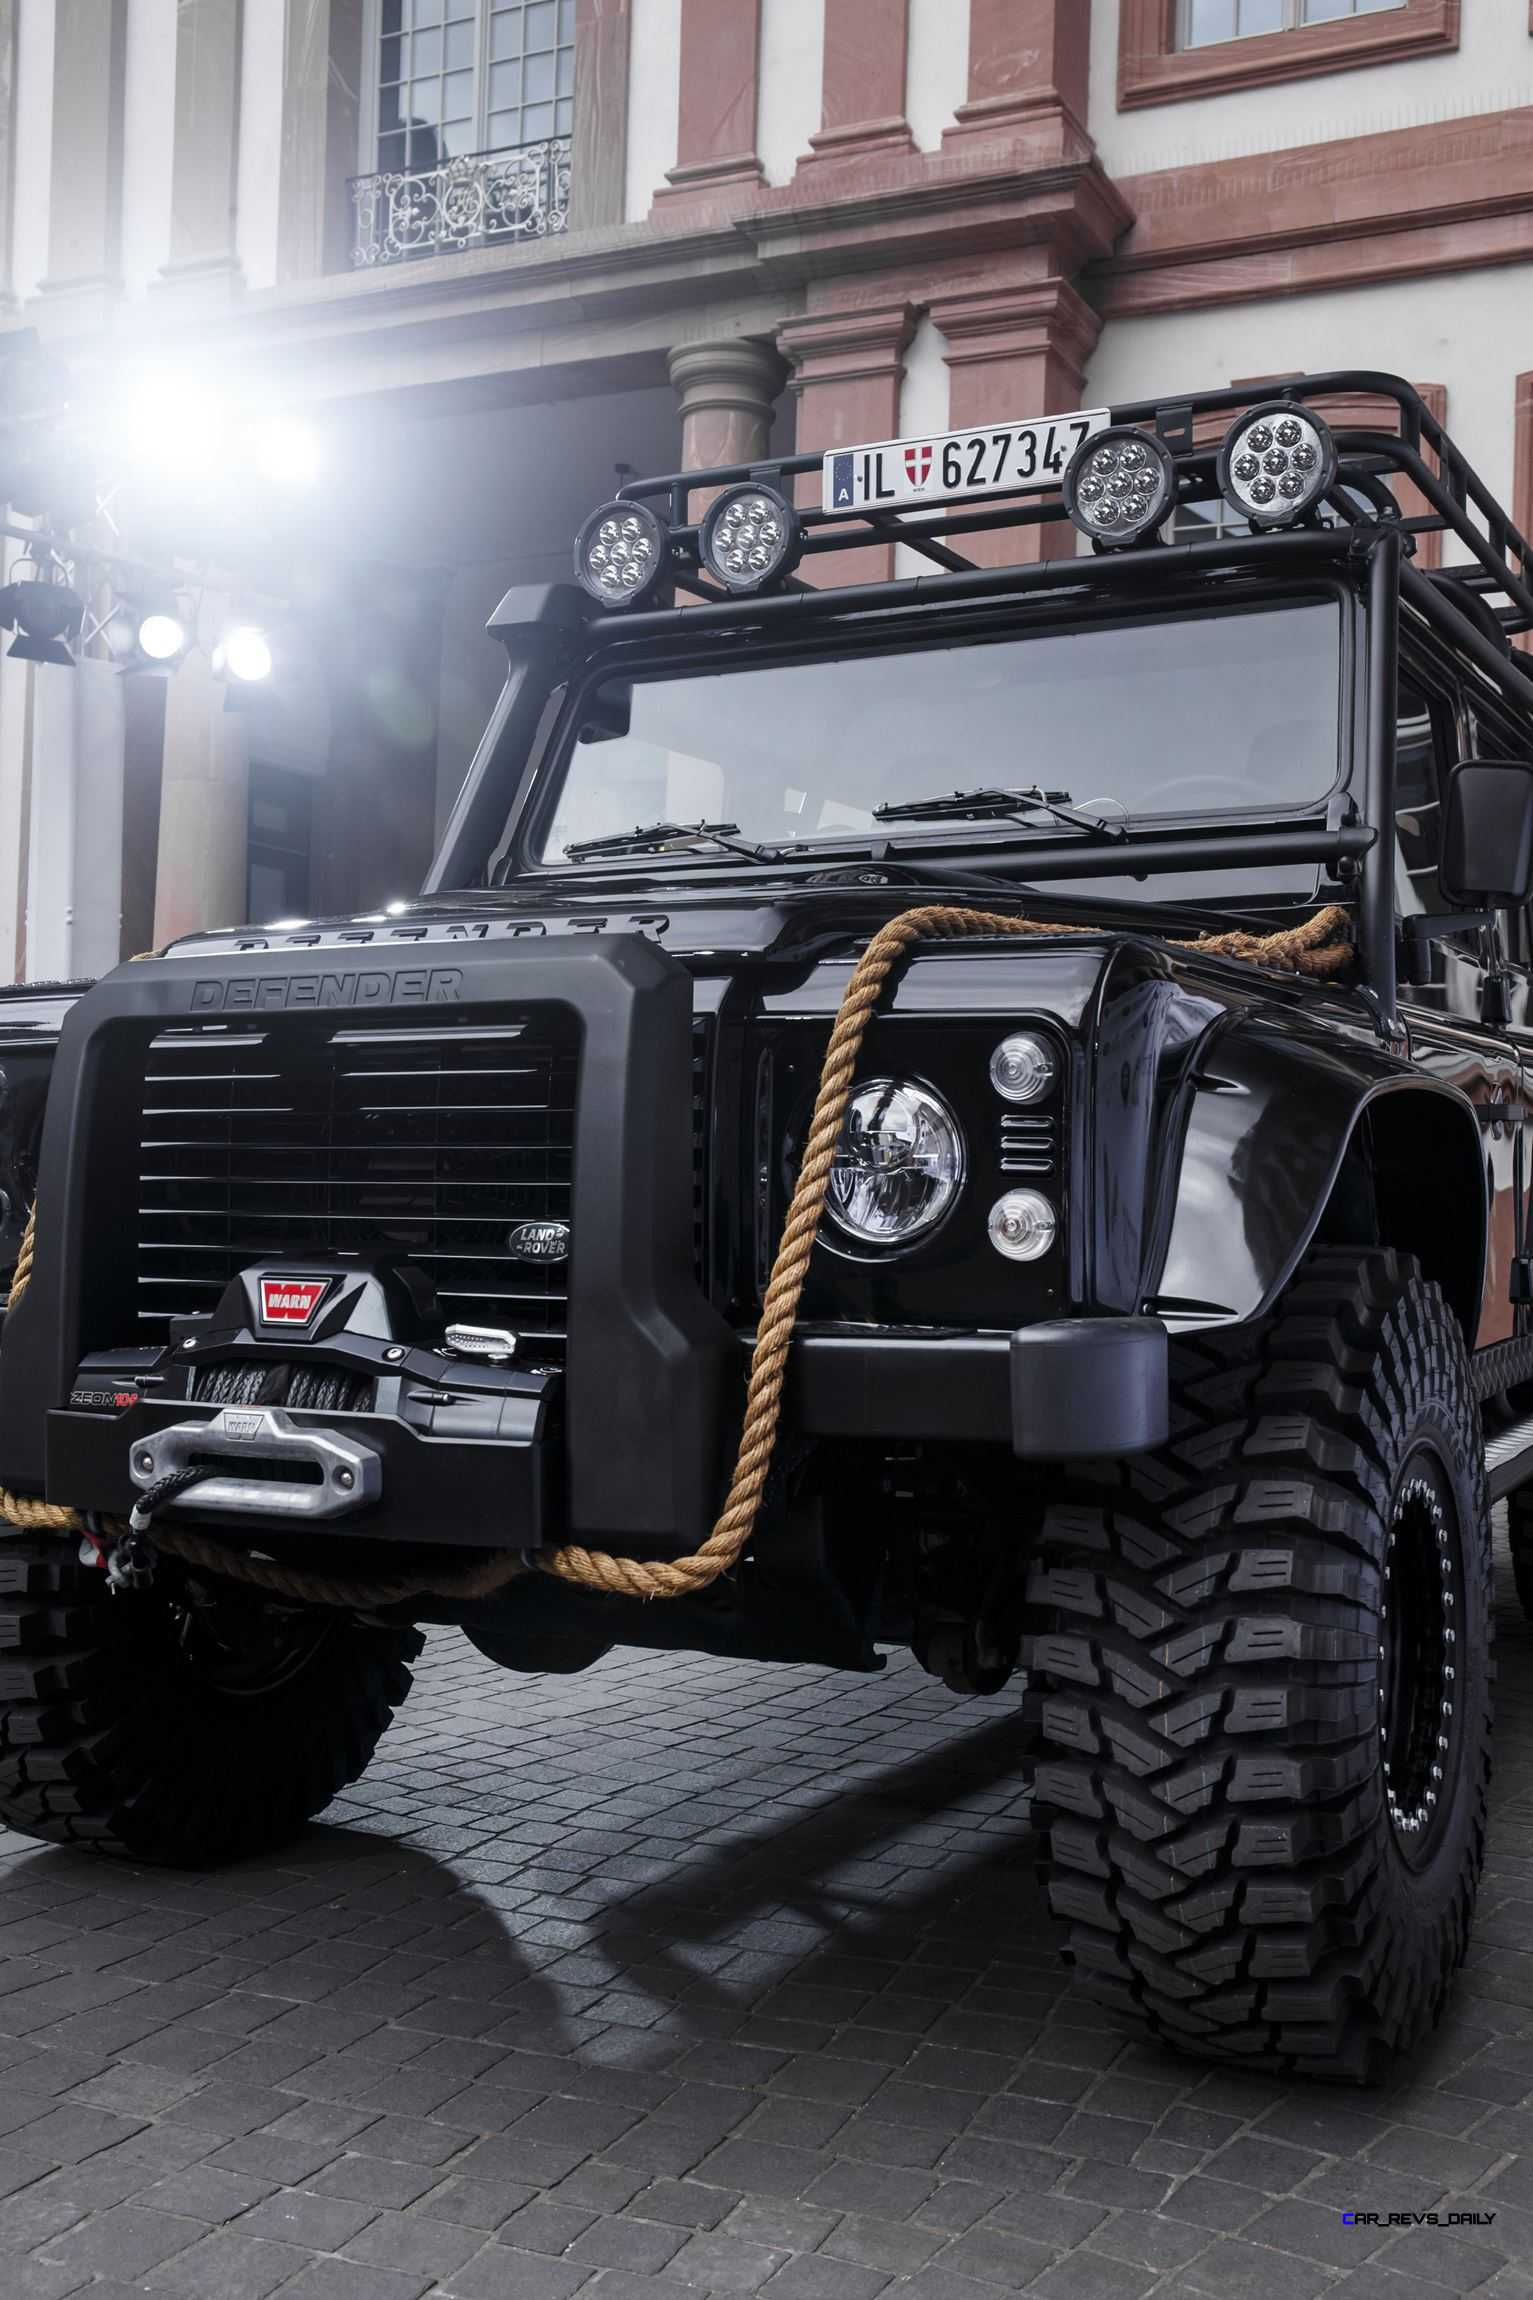 jaguar land rover james bond launch party 2015 120 photo mega gallery. Black Bedroom Furniture Sets. Home Design Ideas